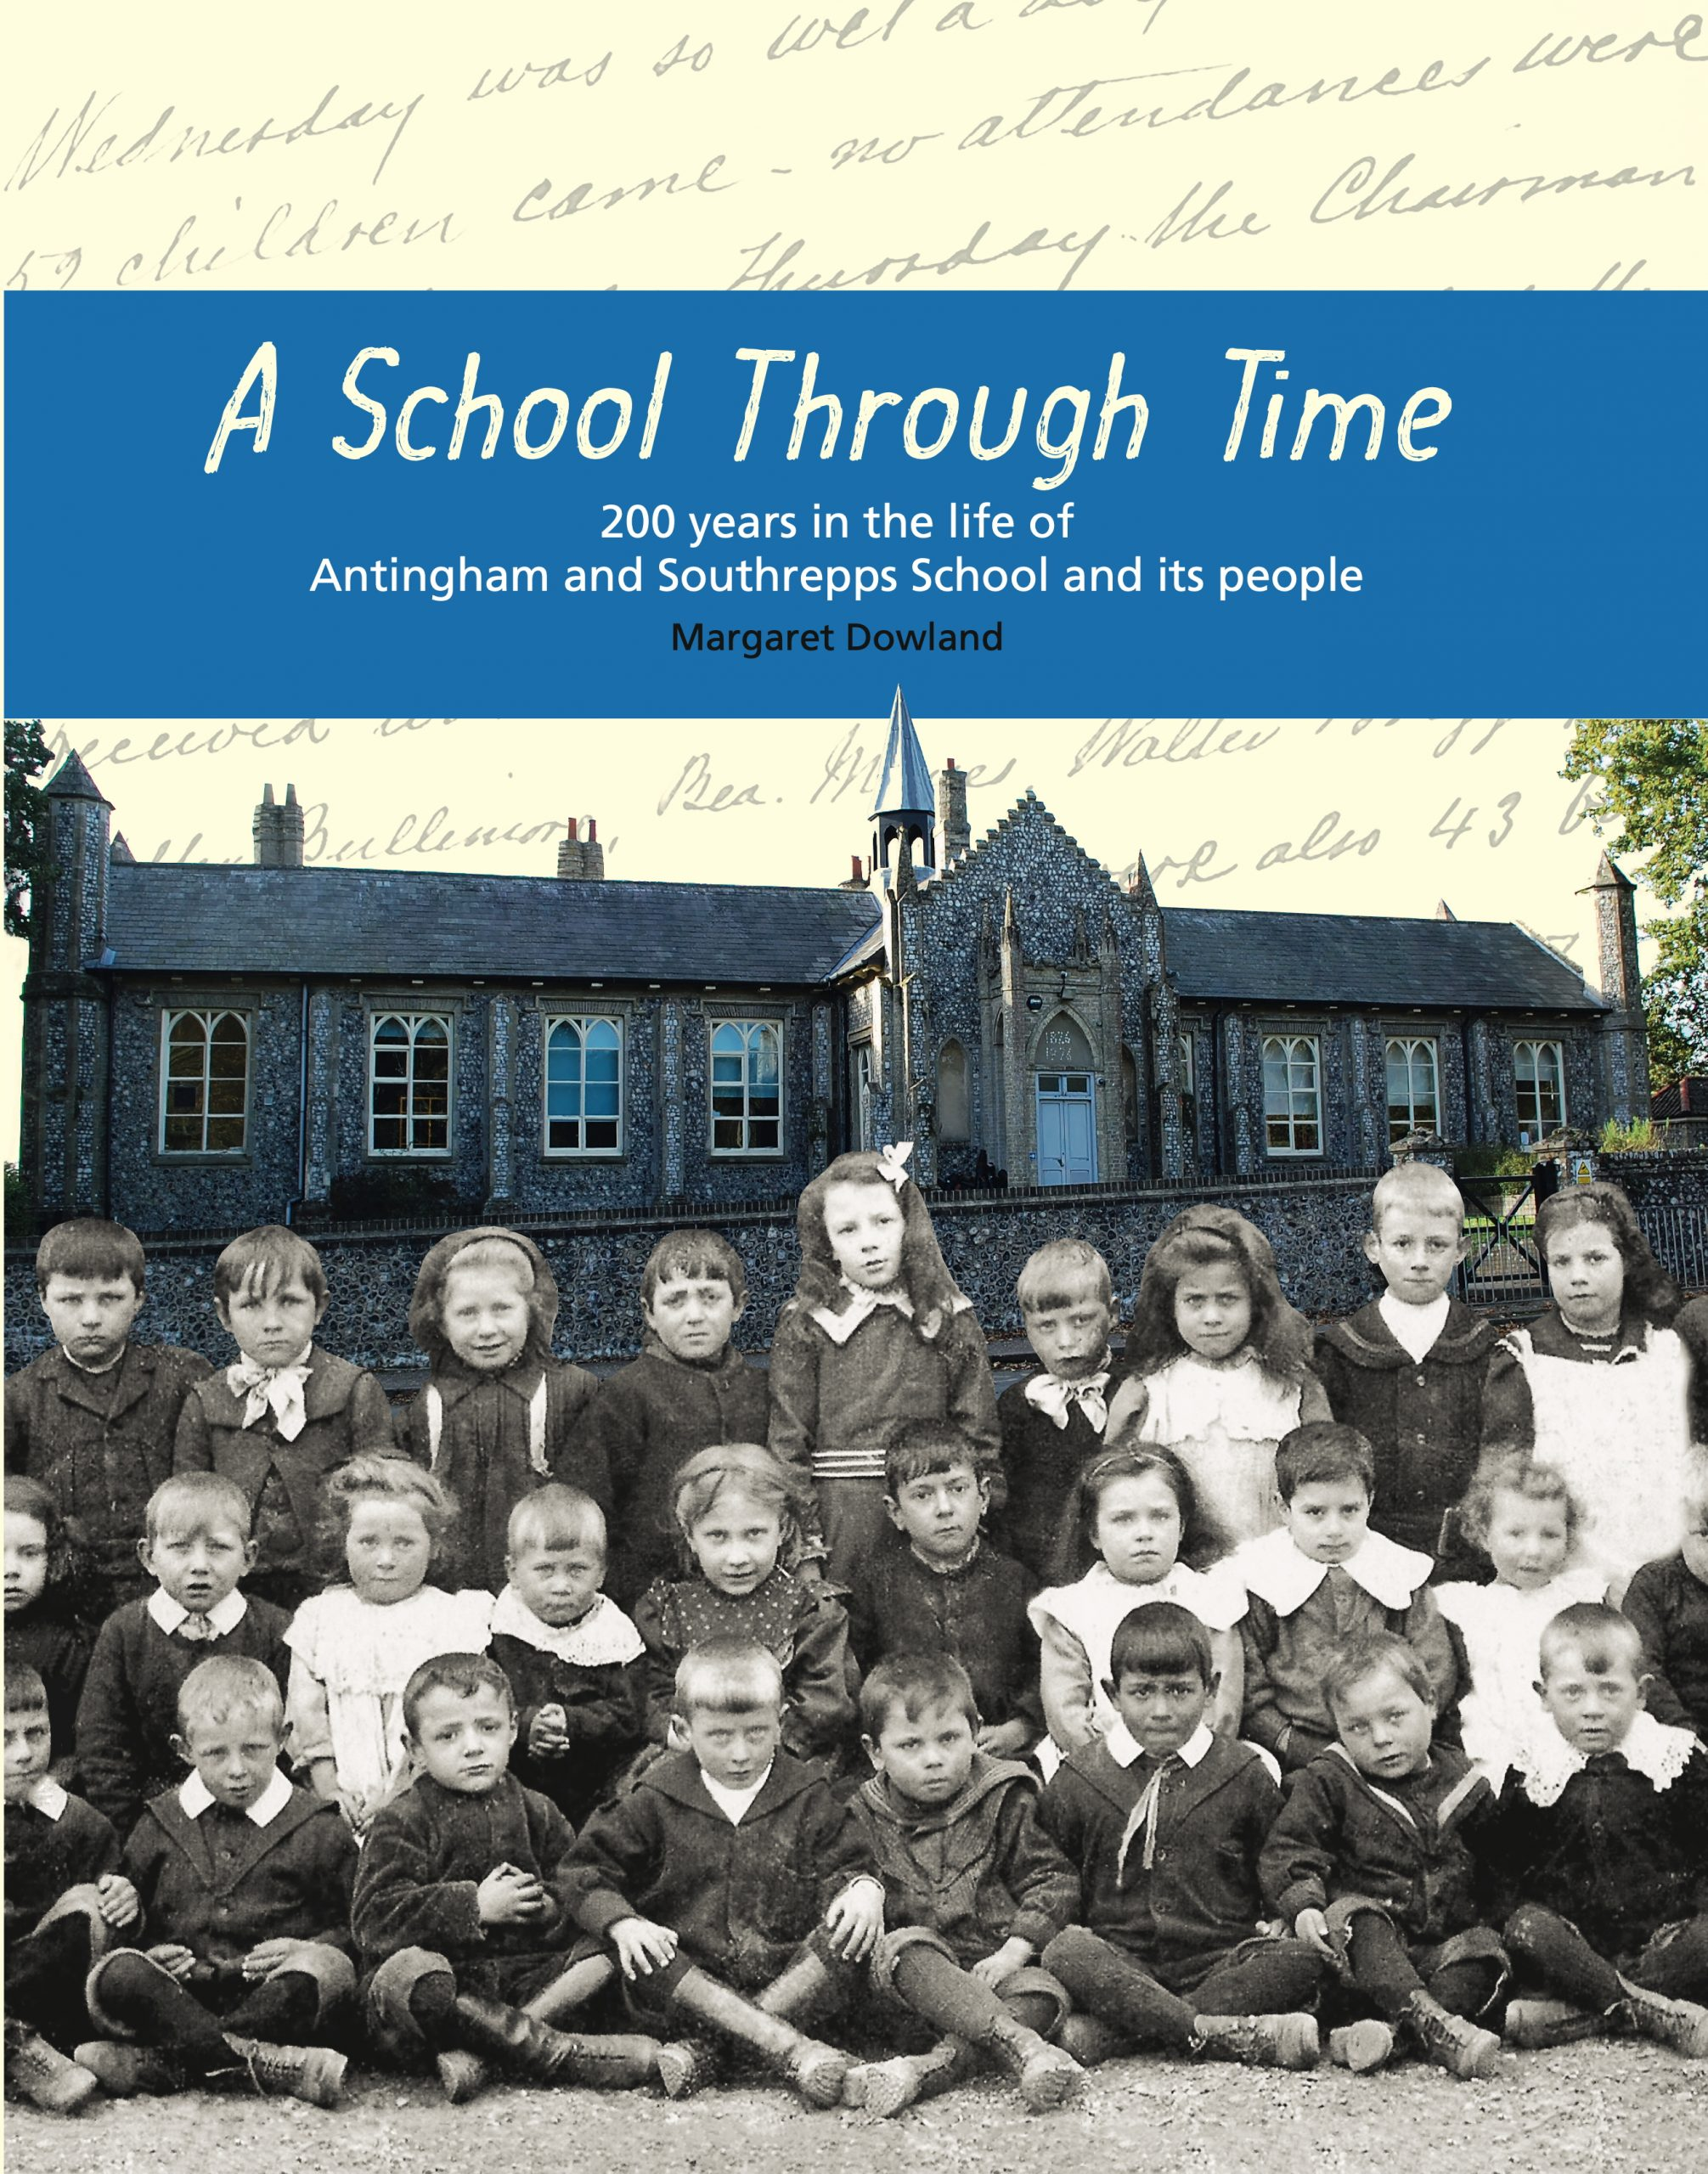 A School Through Time